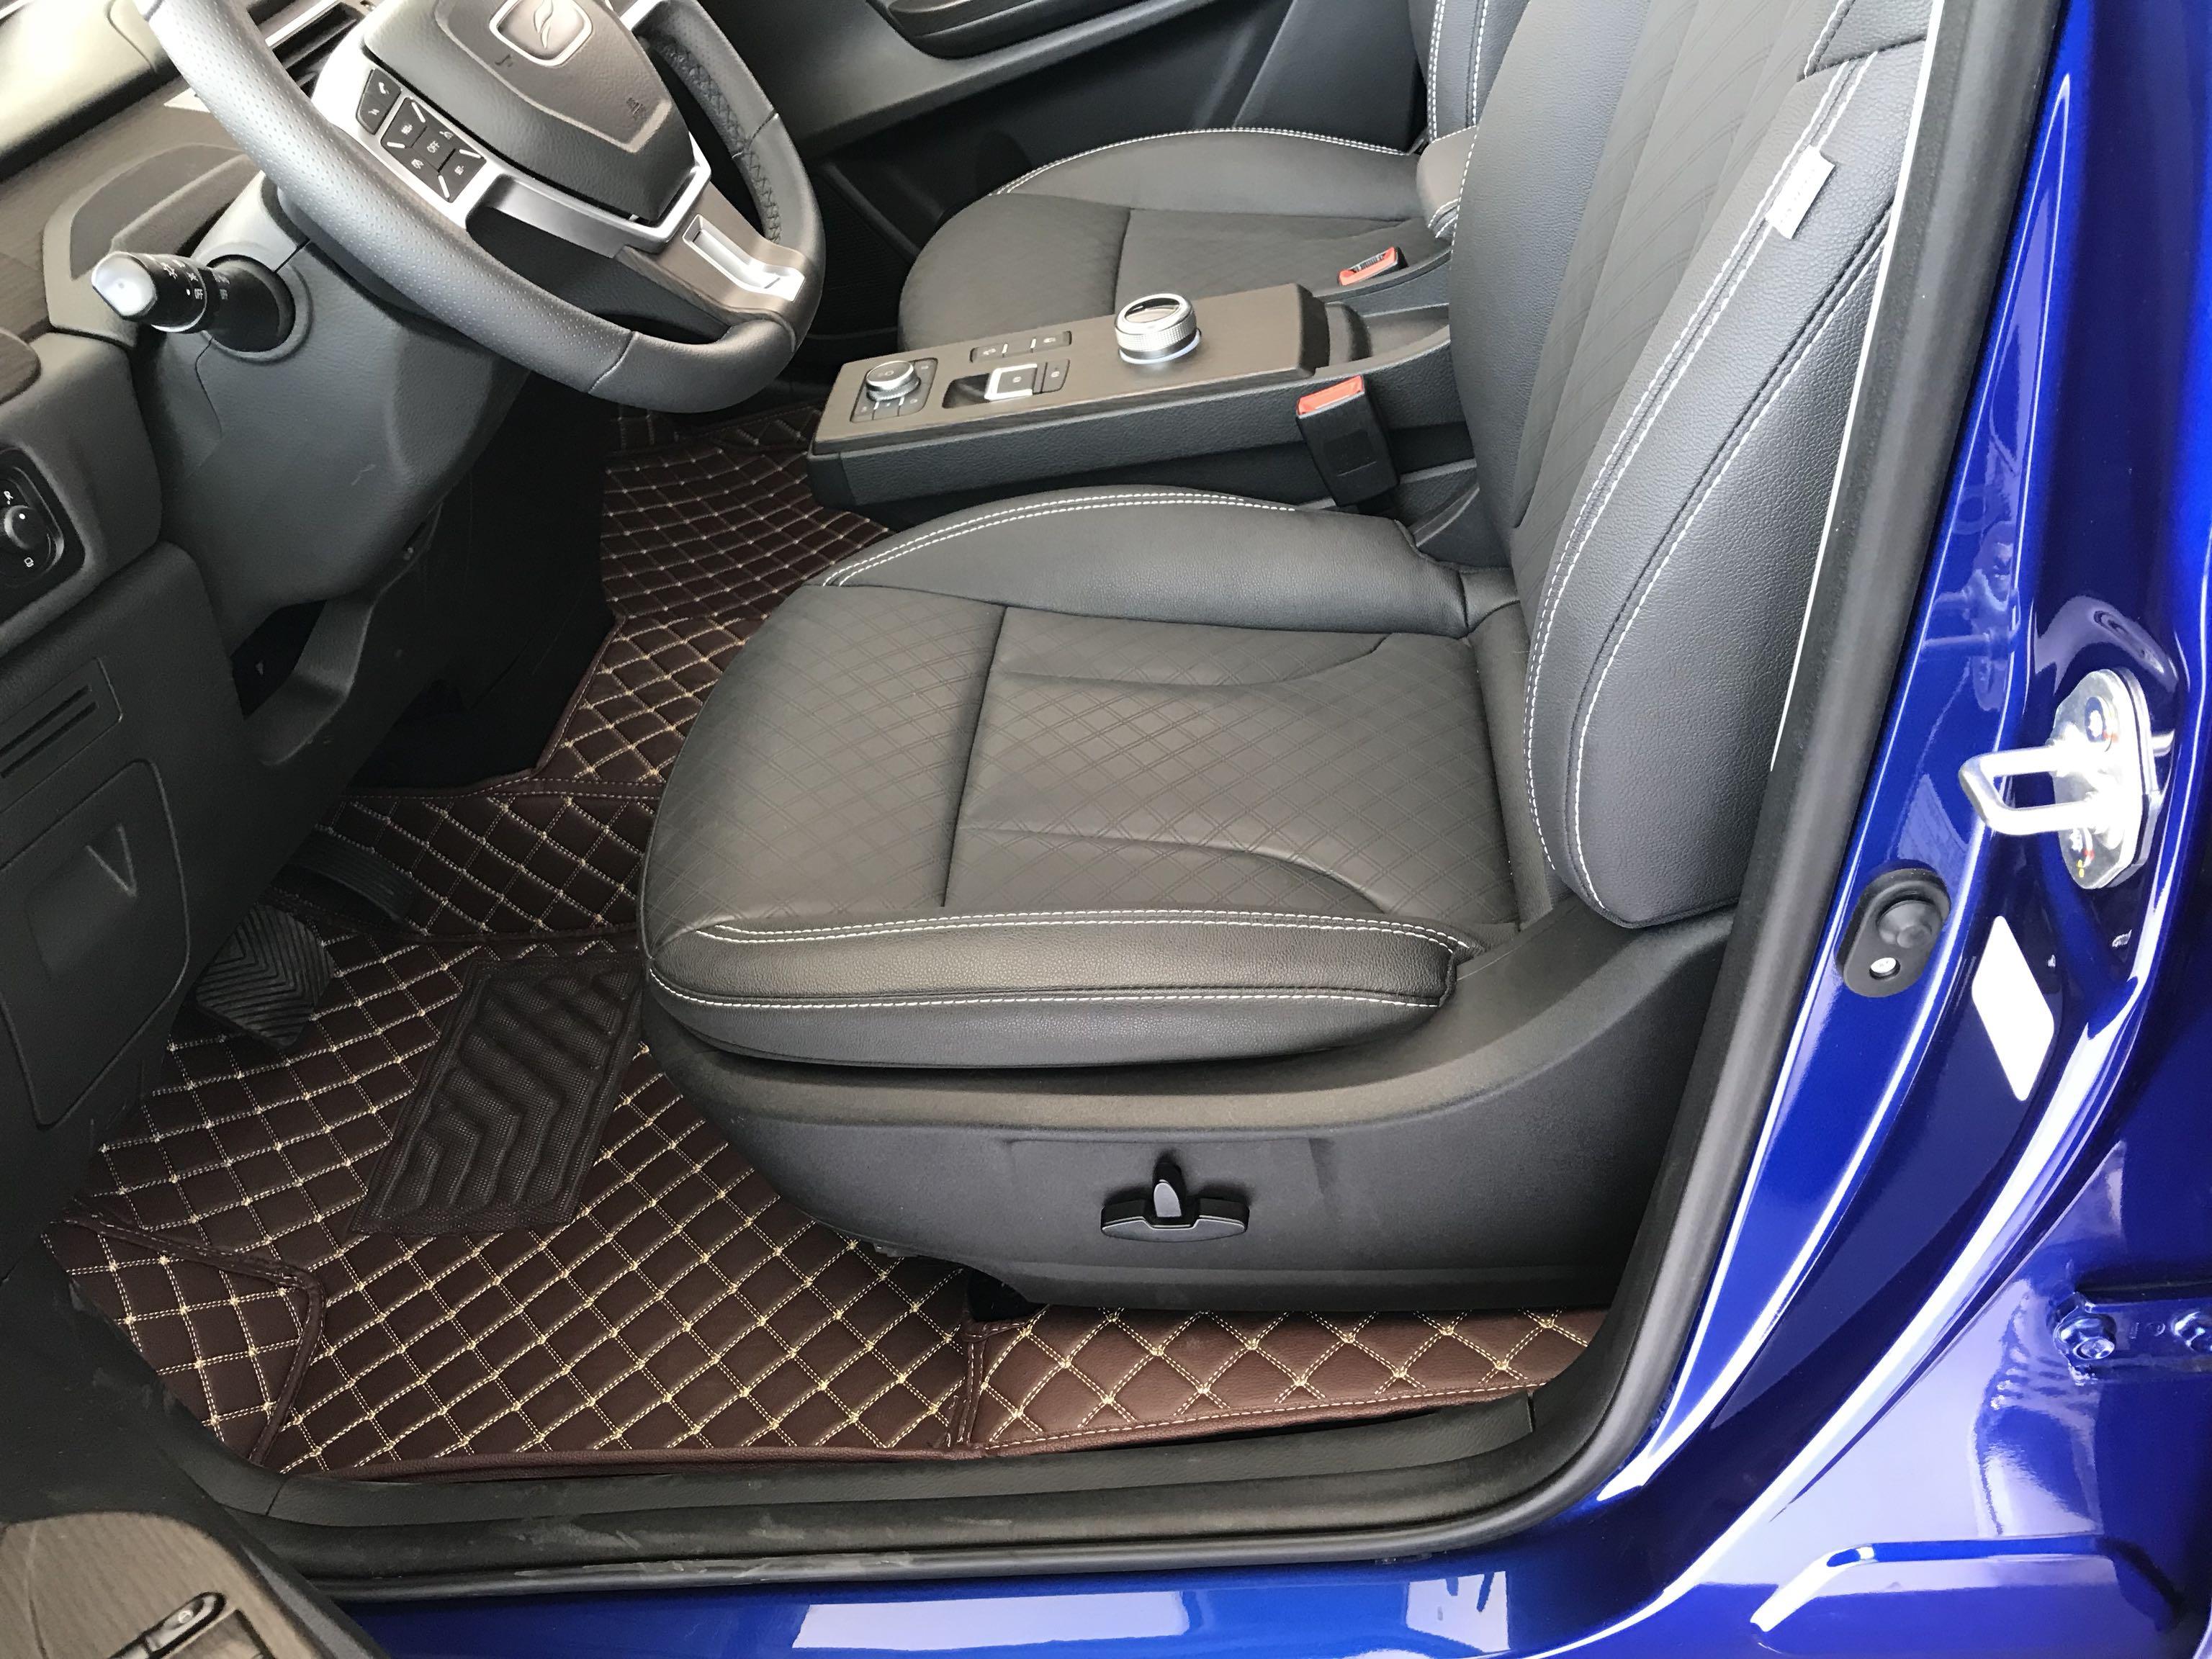 No Odor All Surrounded Waterproof Durable Rugs Custom Car Floor Mats For Volkswagen Beetle Golf Tiguan Sharan Passat CC EOS